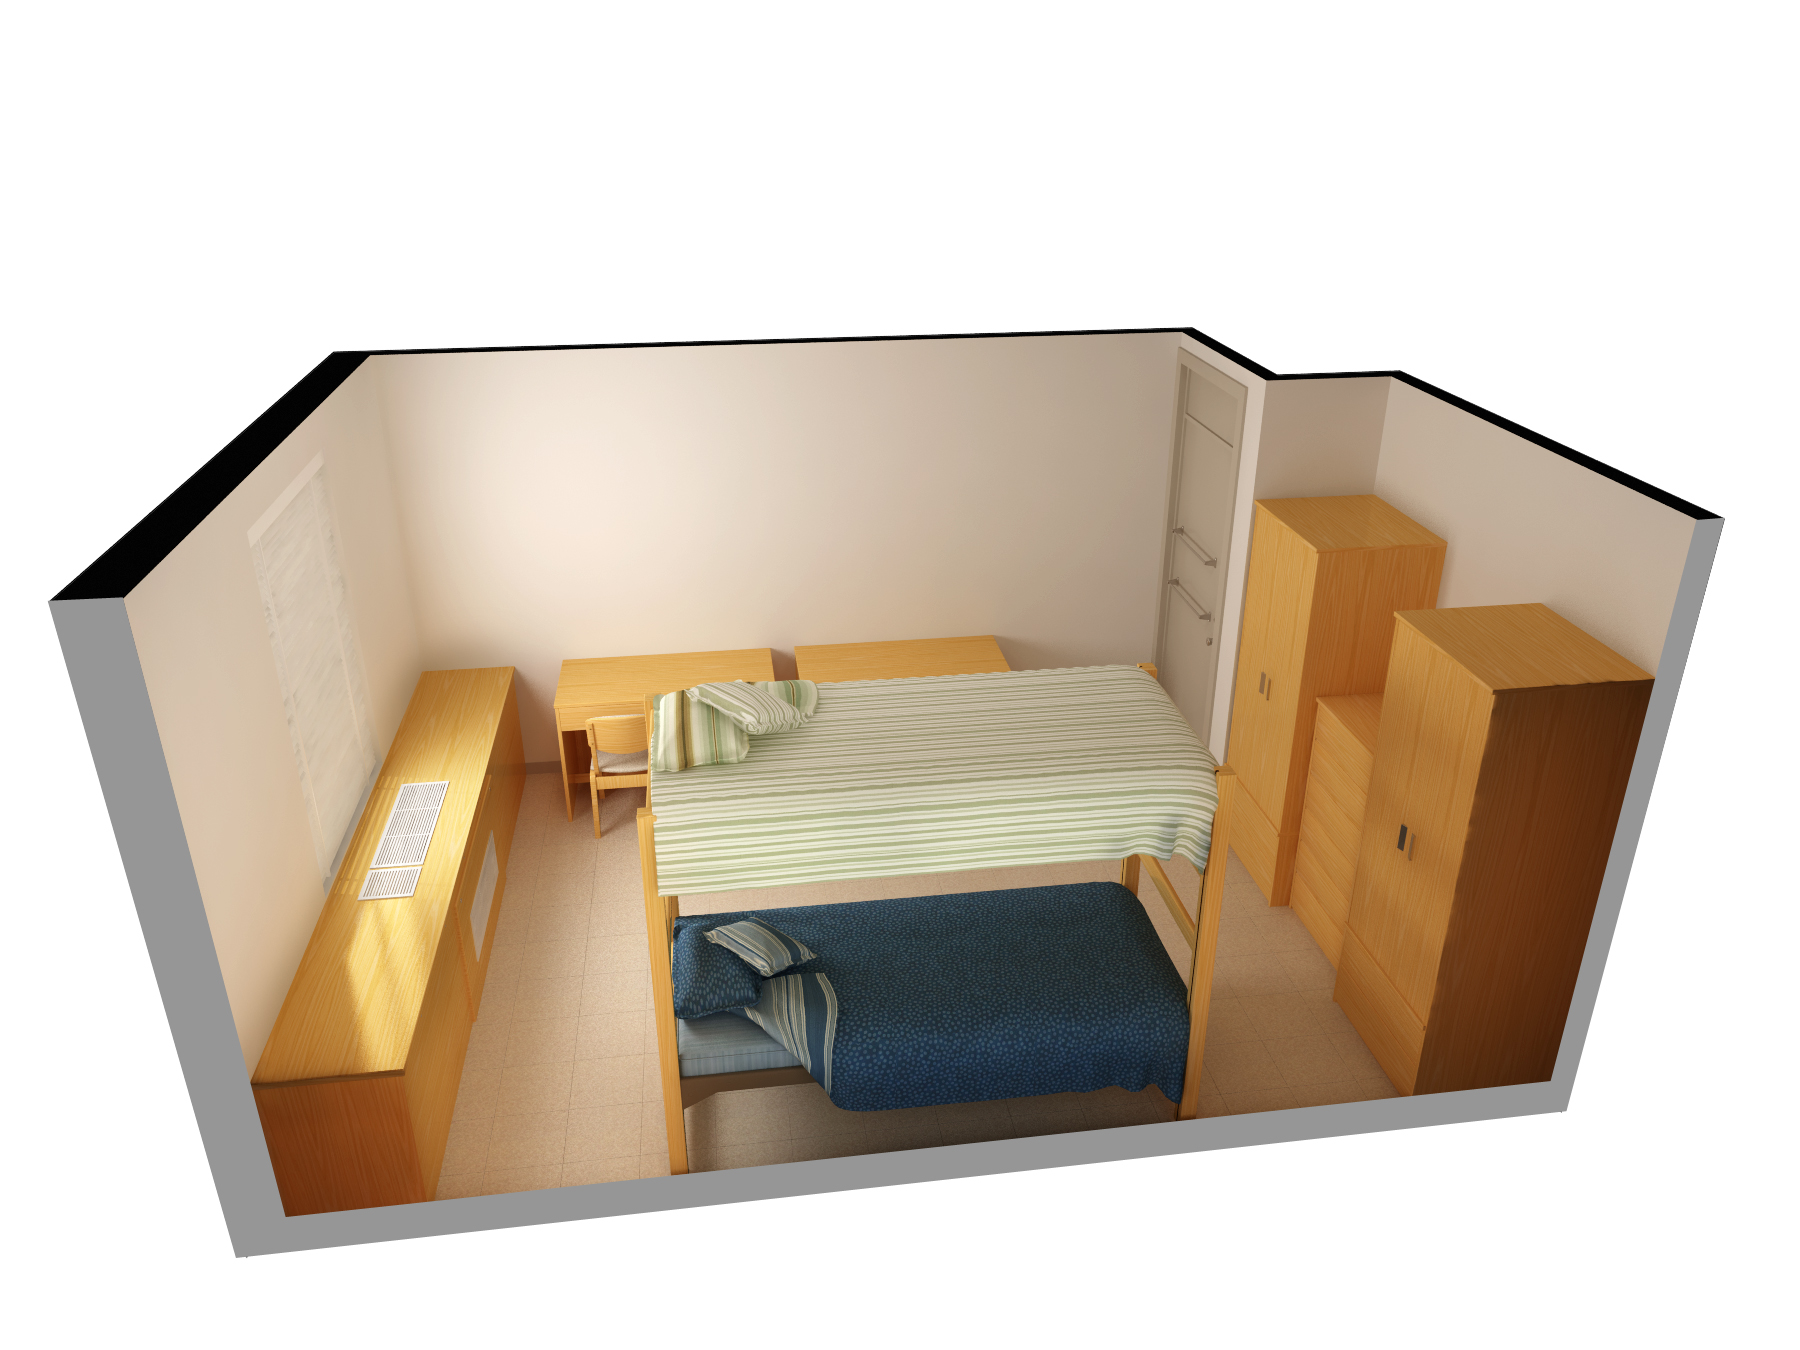 Beautifull Virtual Bedroom (Image 1 of 10)